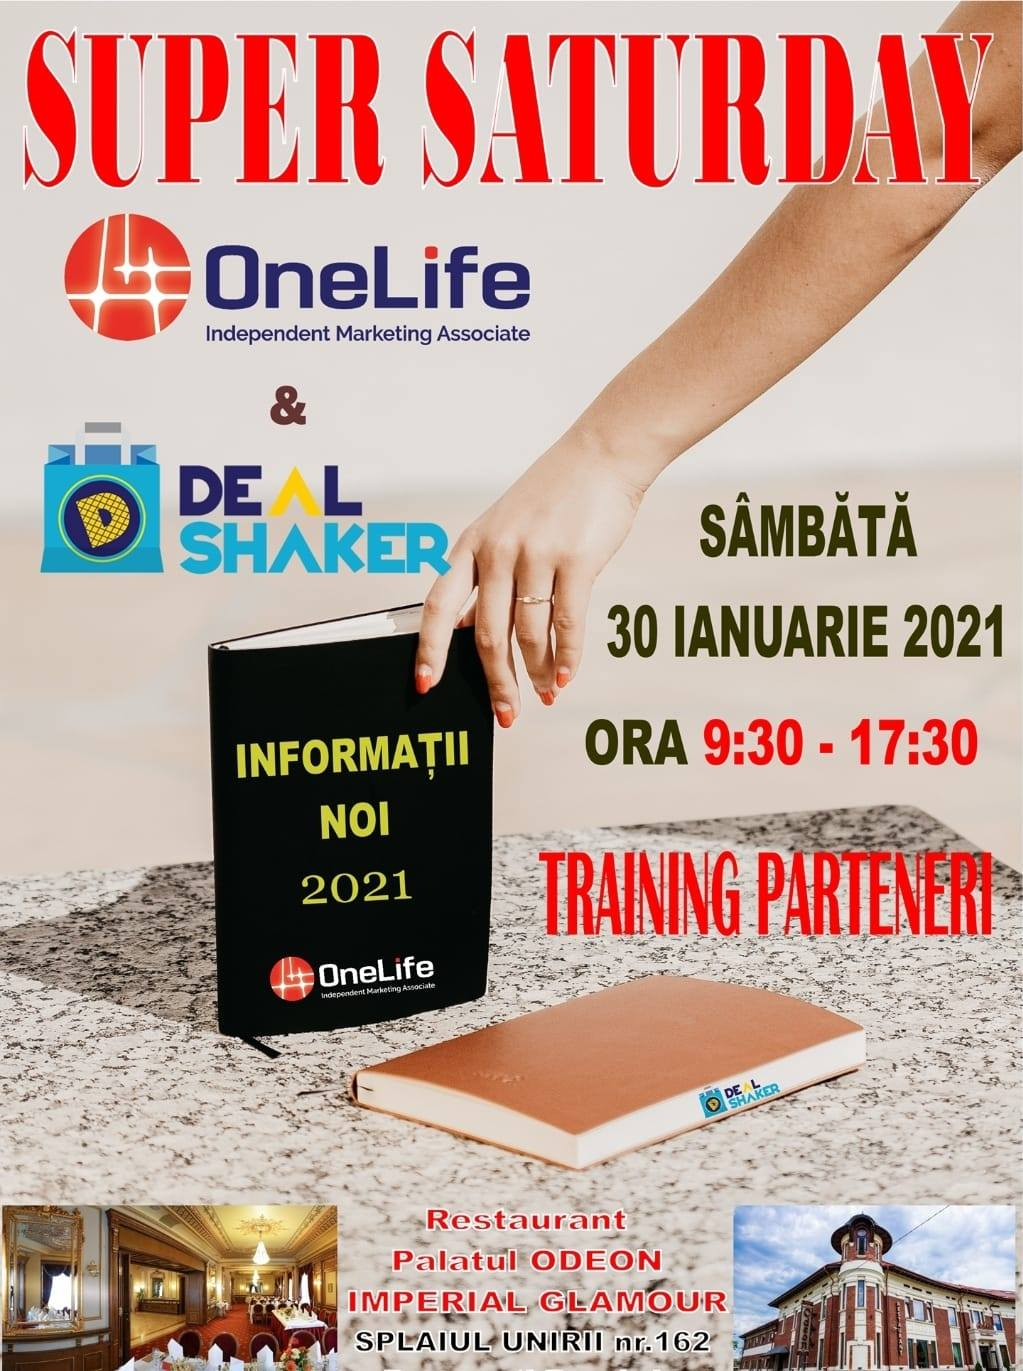 Super Saturday. Primul training integrat OneLife & Dealshaker din 2021 143077011 3883285011721112 7671101694367386565 o